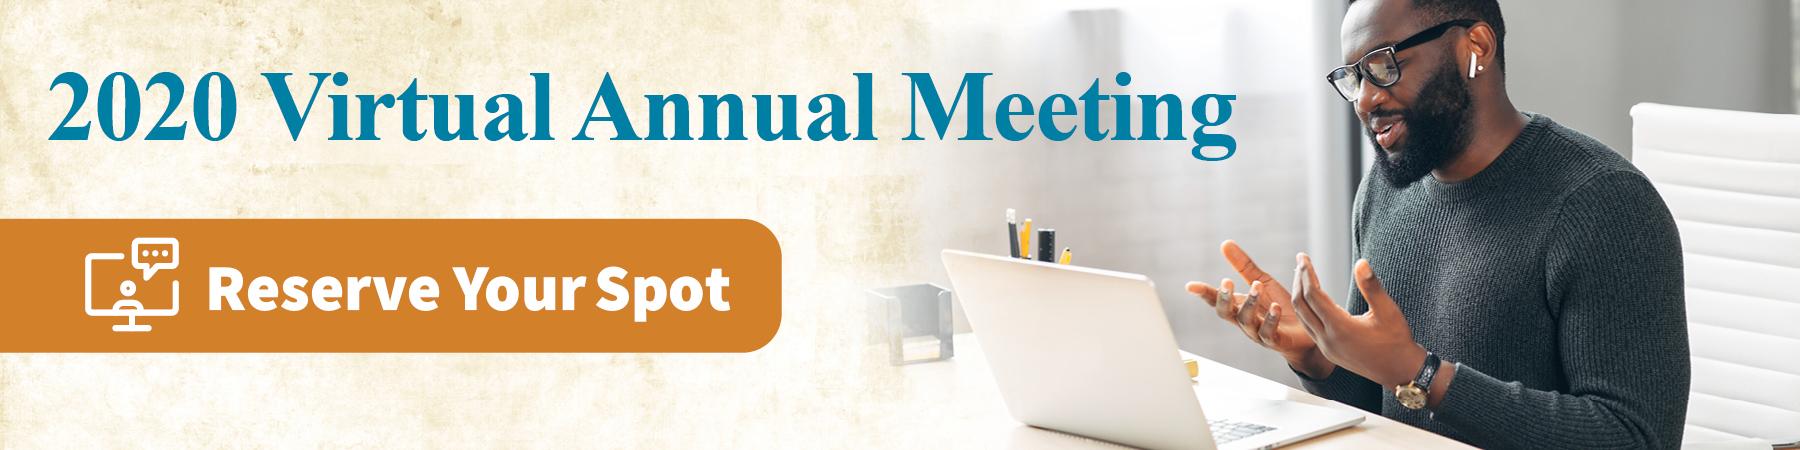 Annual Meeting 2020